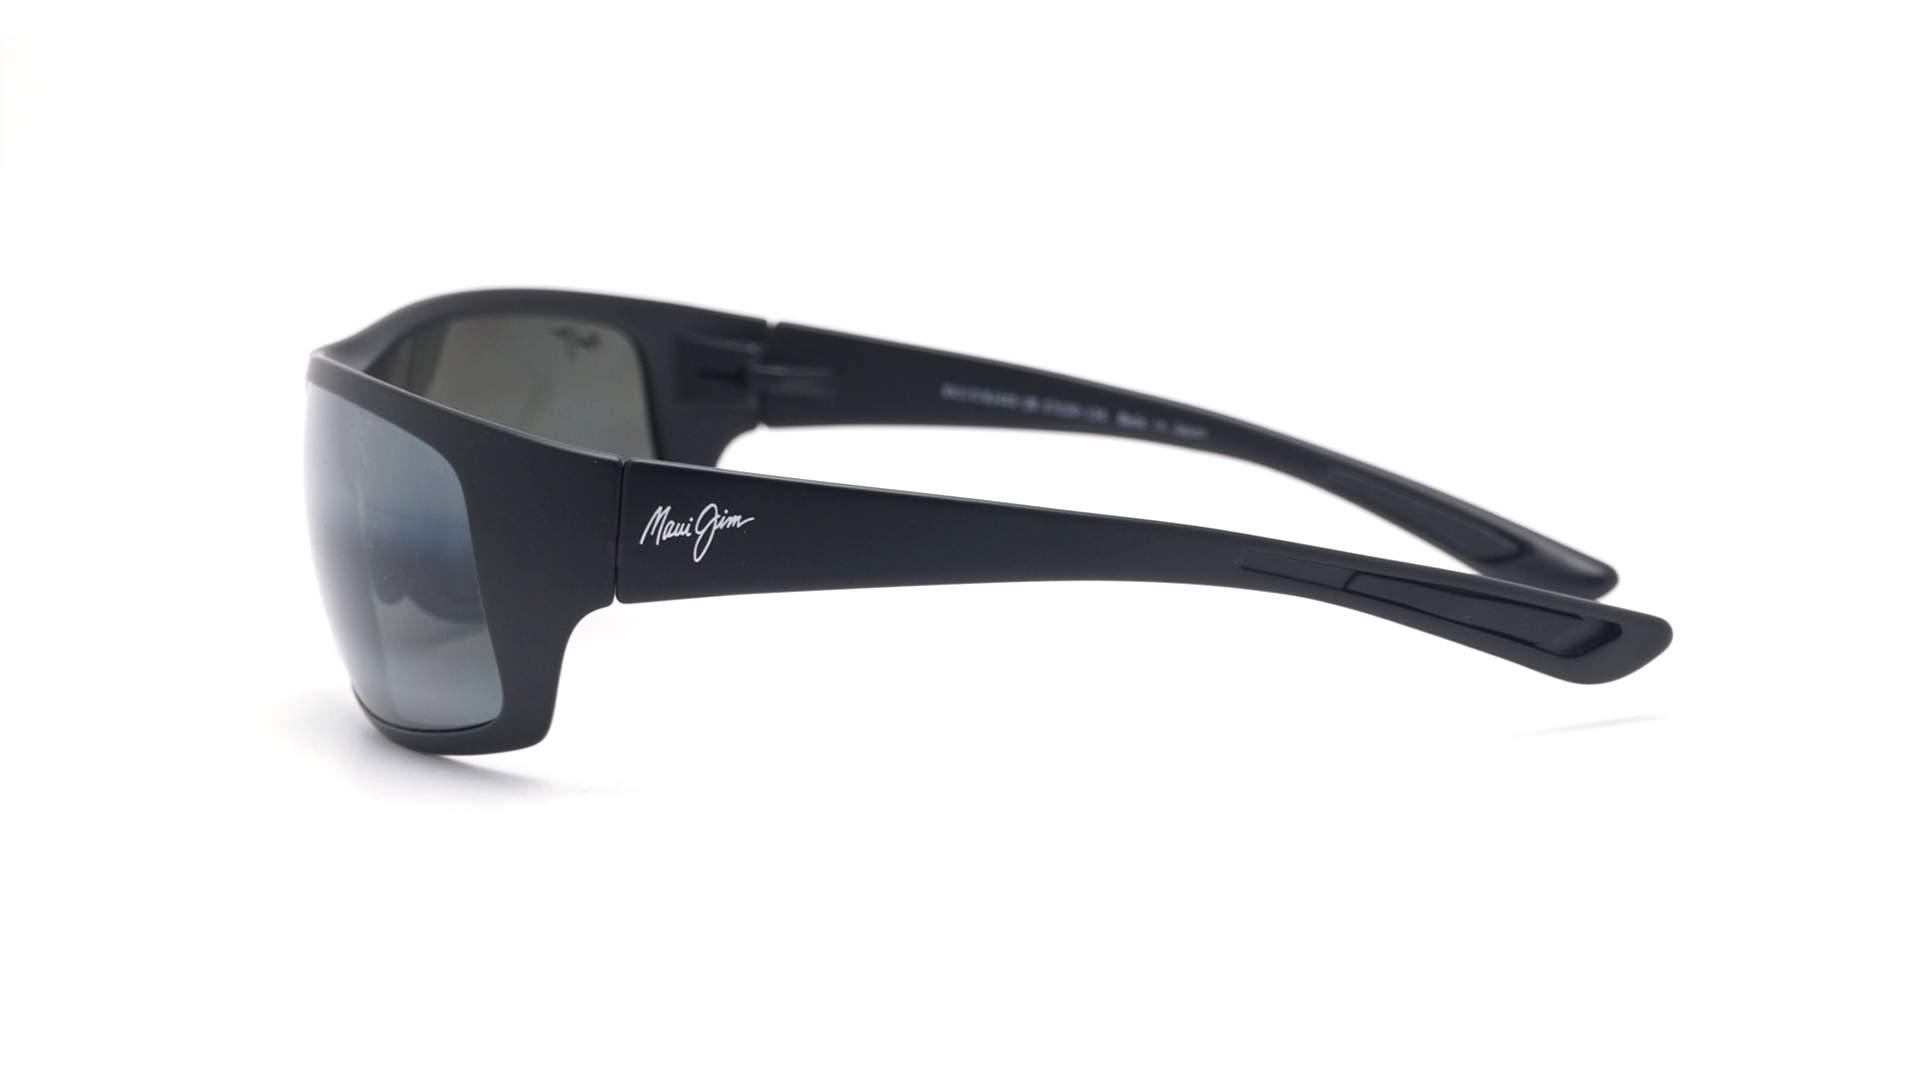 6b54c5a4763 Sunglasses Maui Jim Big wave Black Matte Maui pure 440-2M Polarized  Gradient Mirror